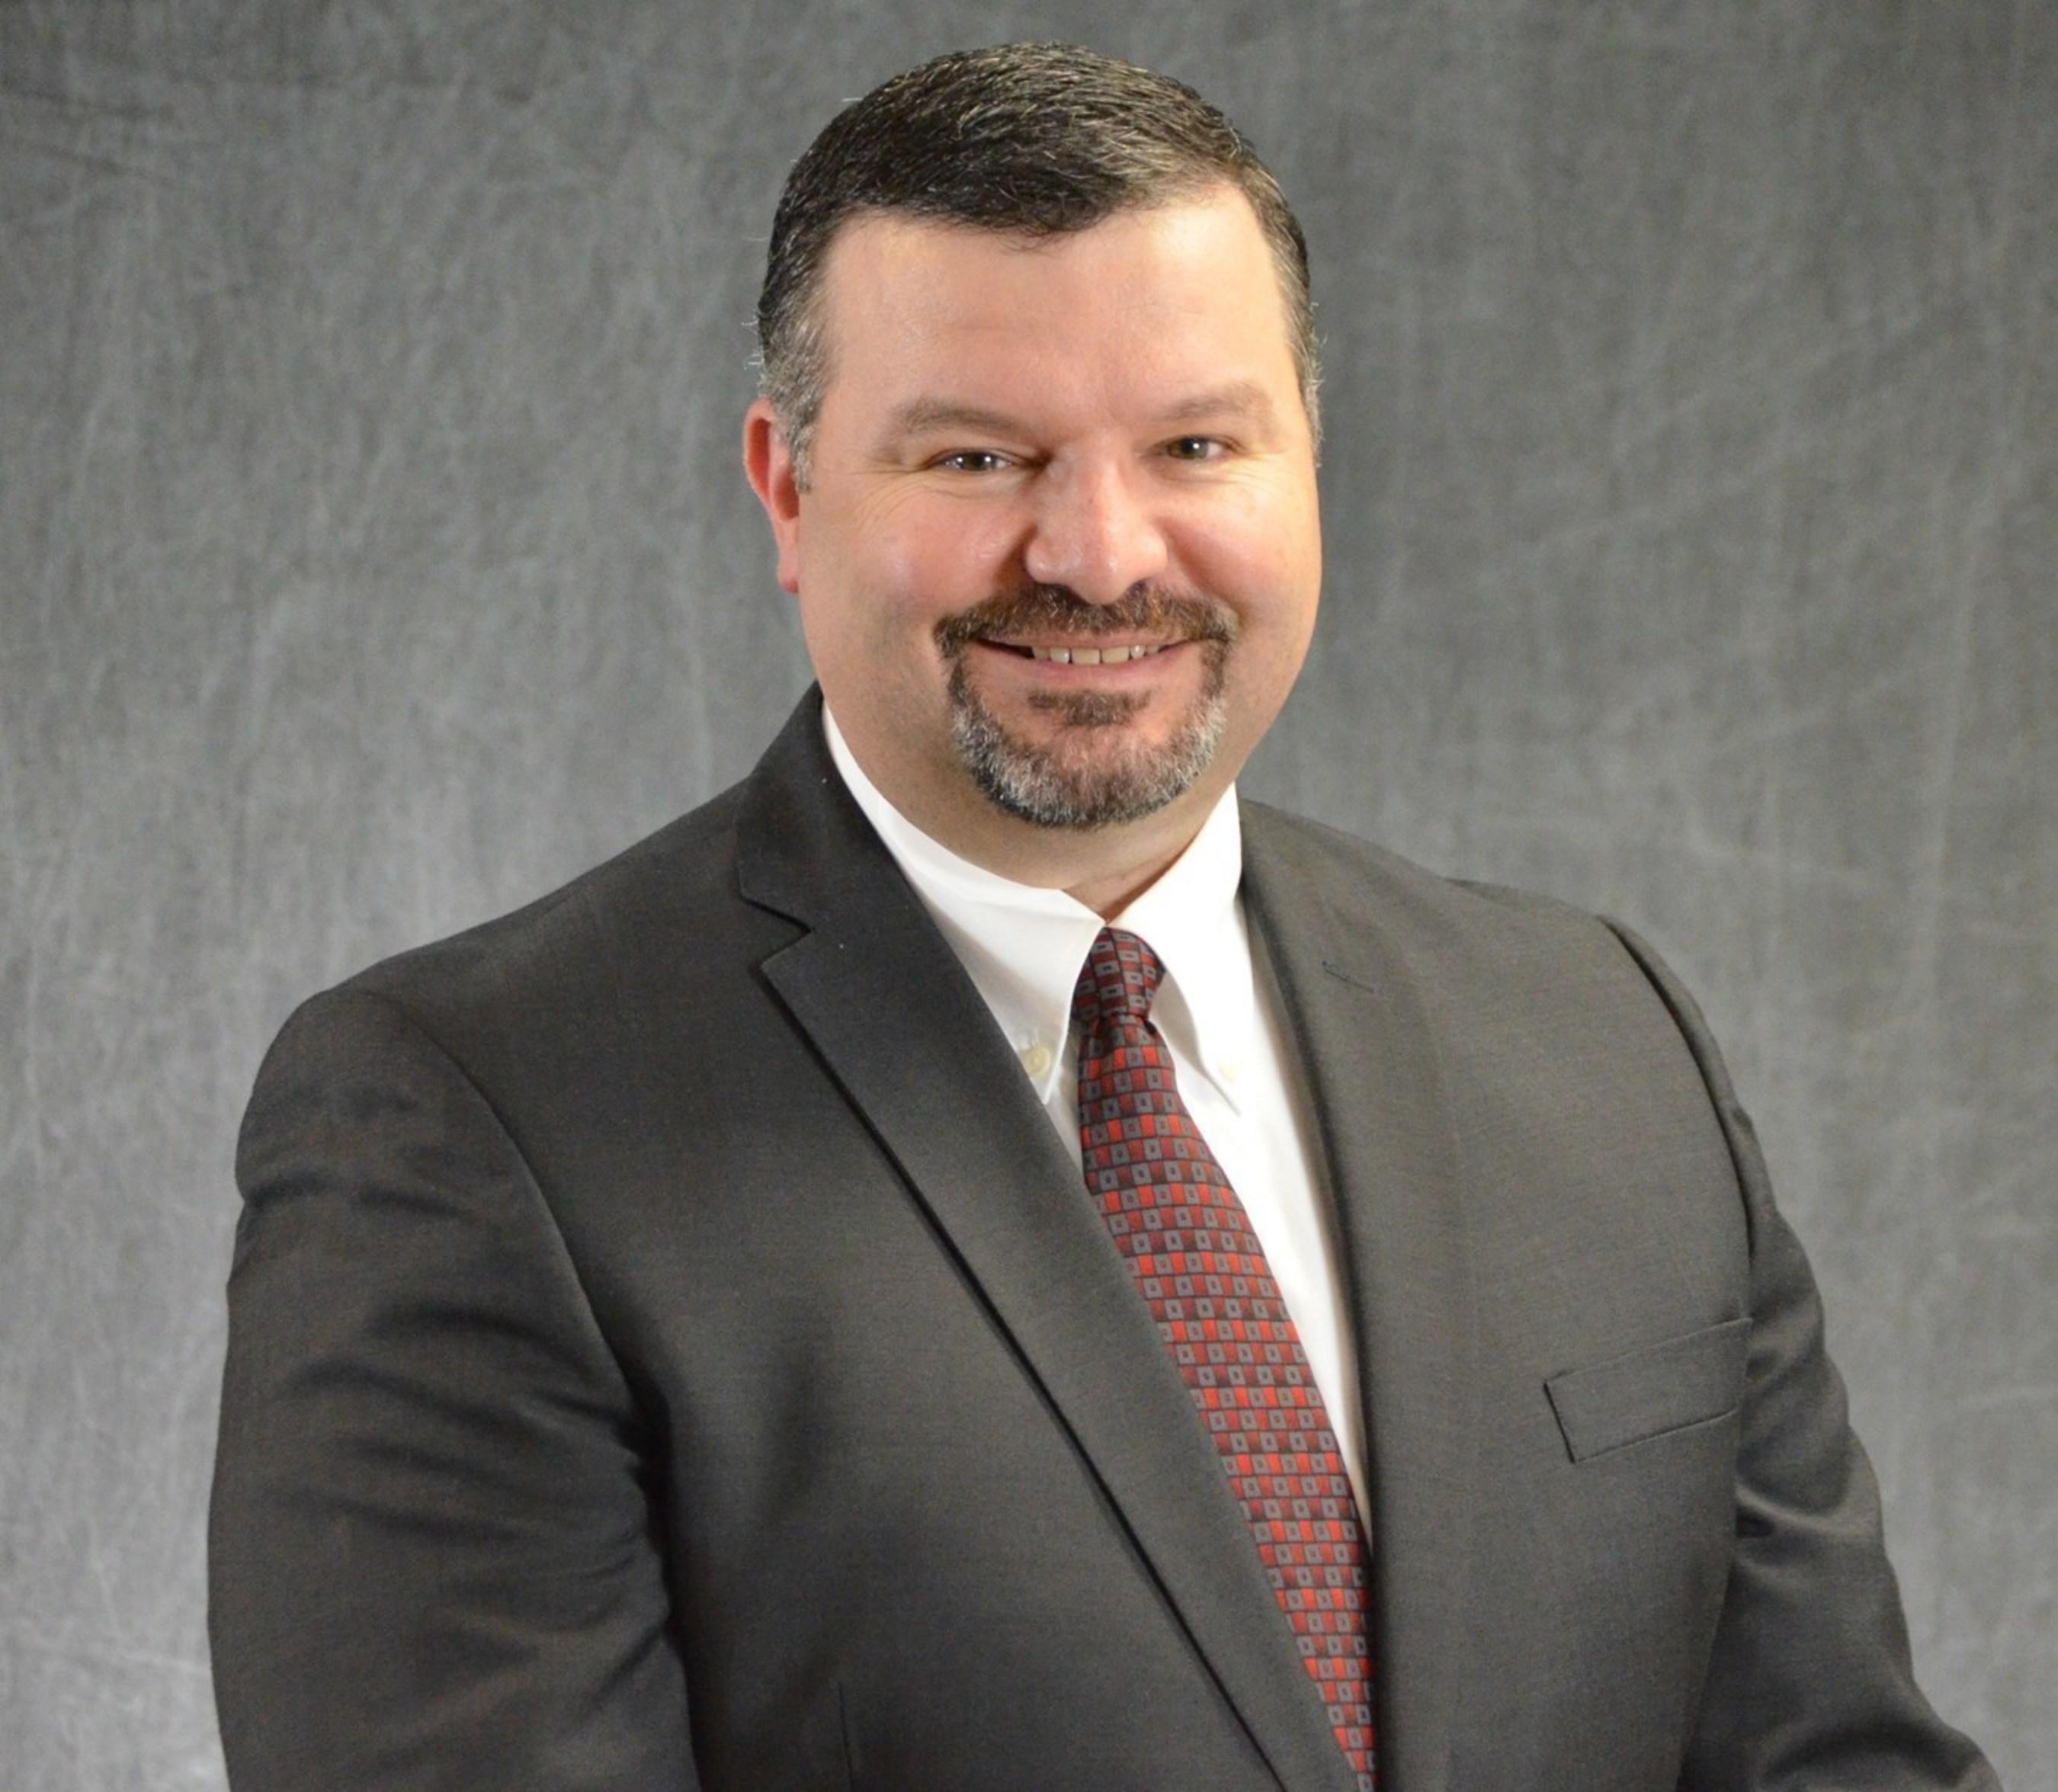 Duane Anderson, CFO, EF Johnson Technologies, Inc.